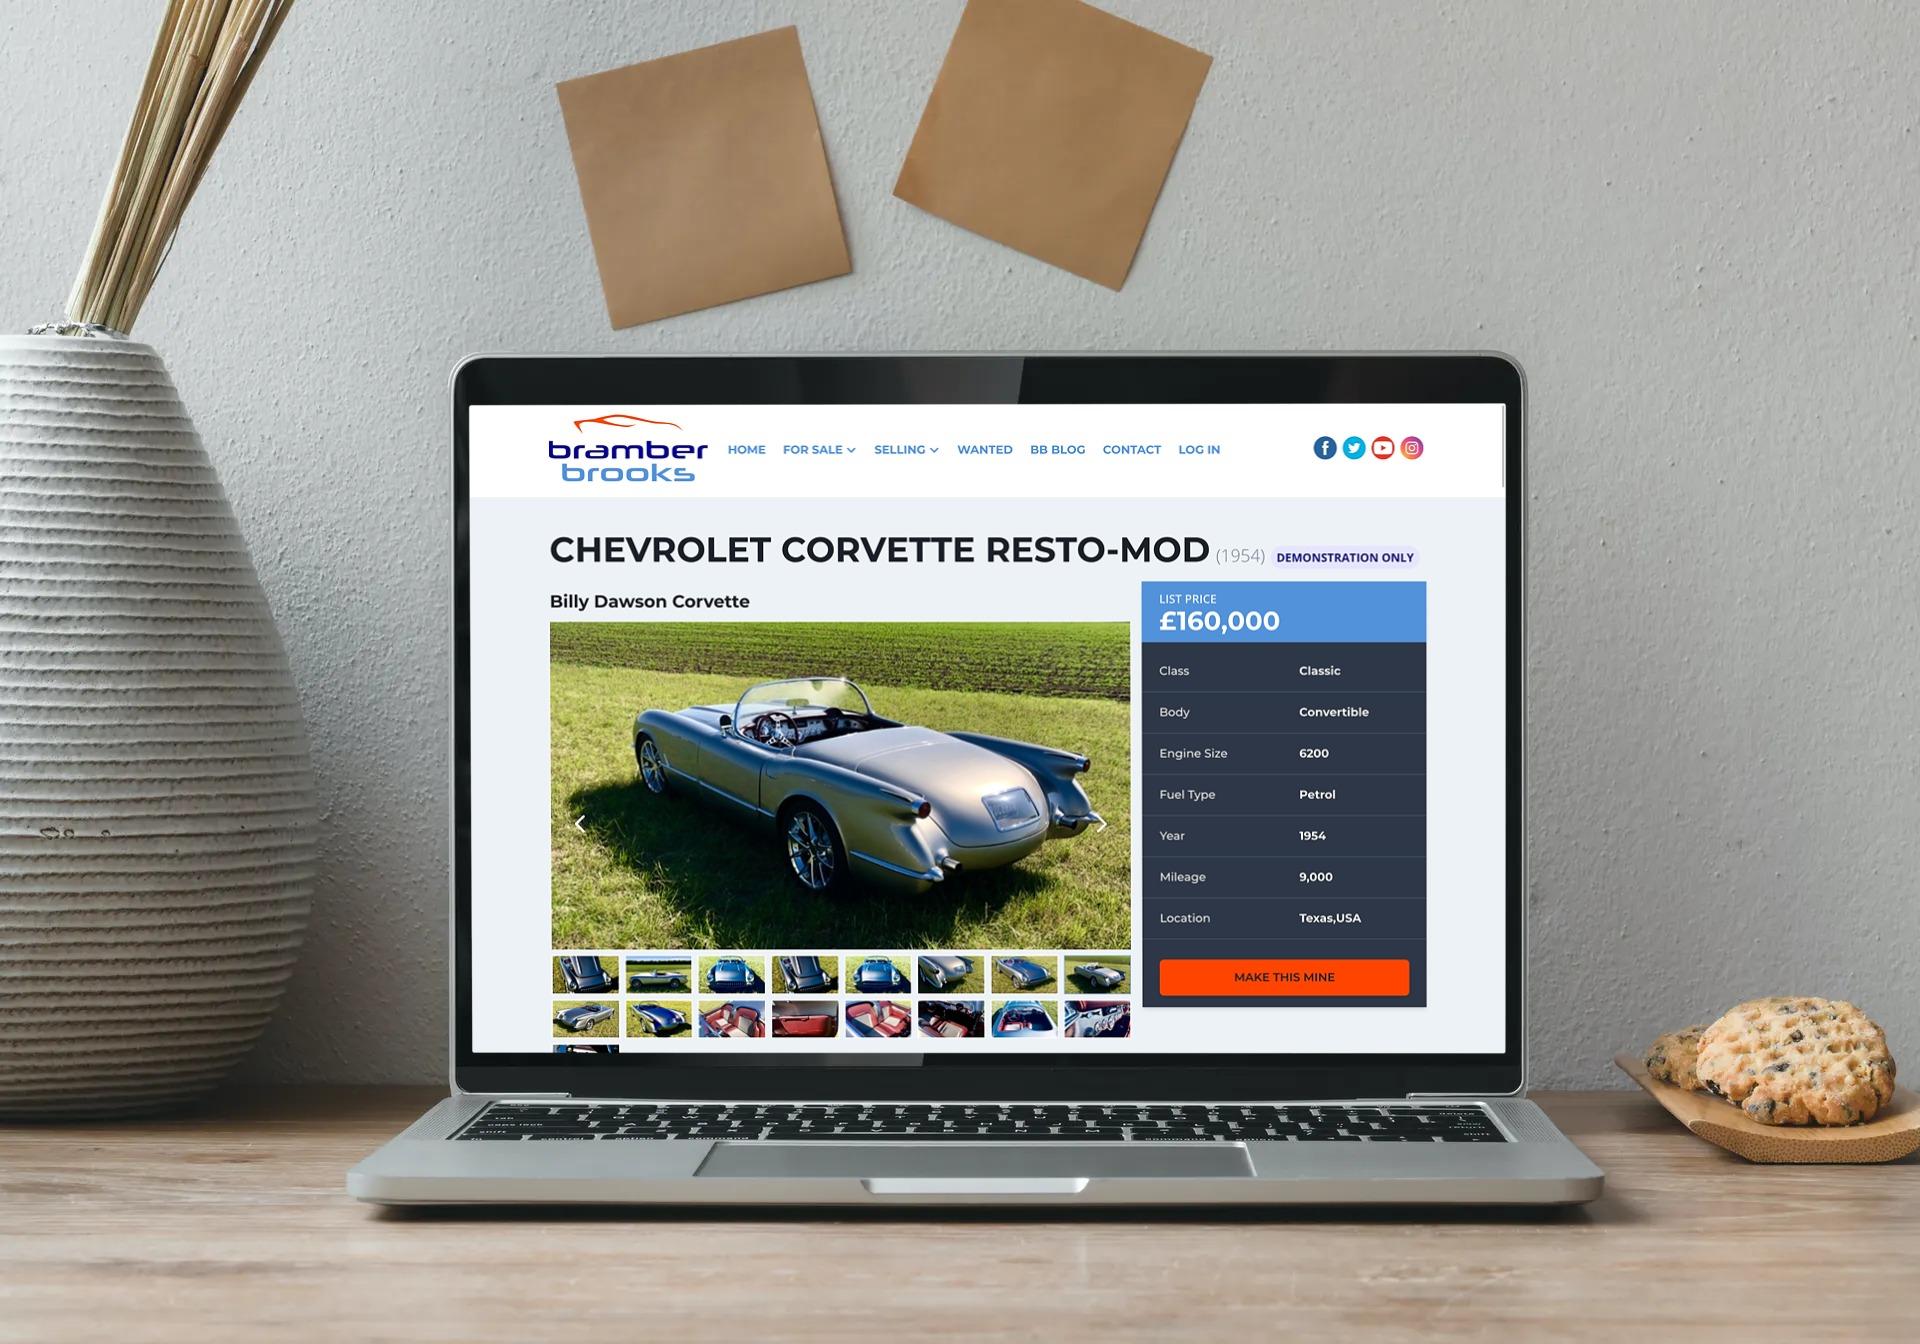 Demo car page on Bramber Brooks website